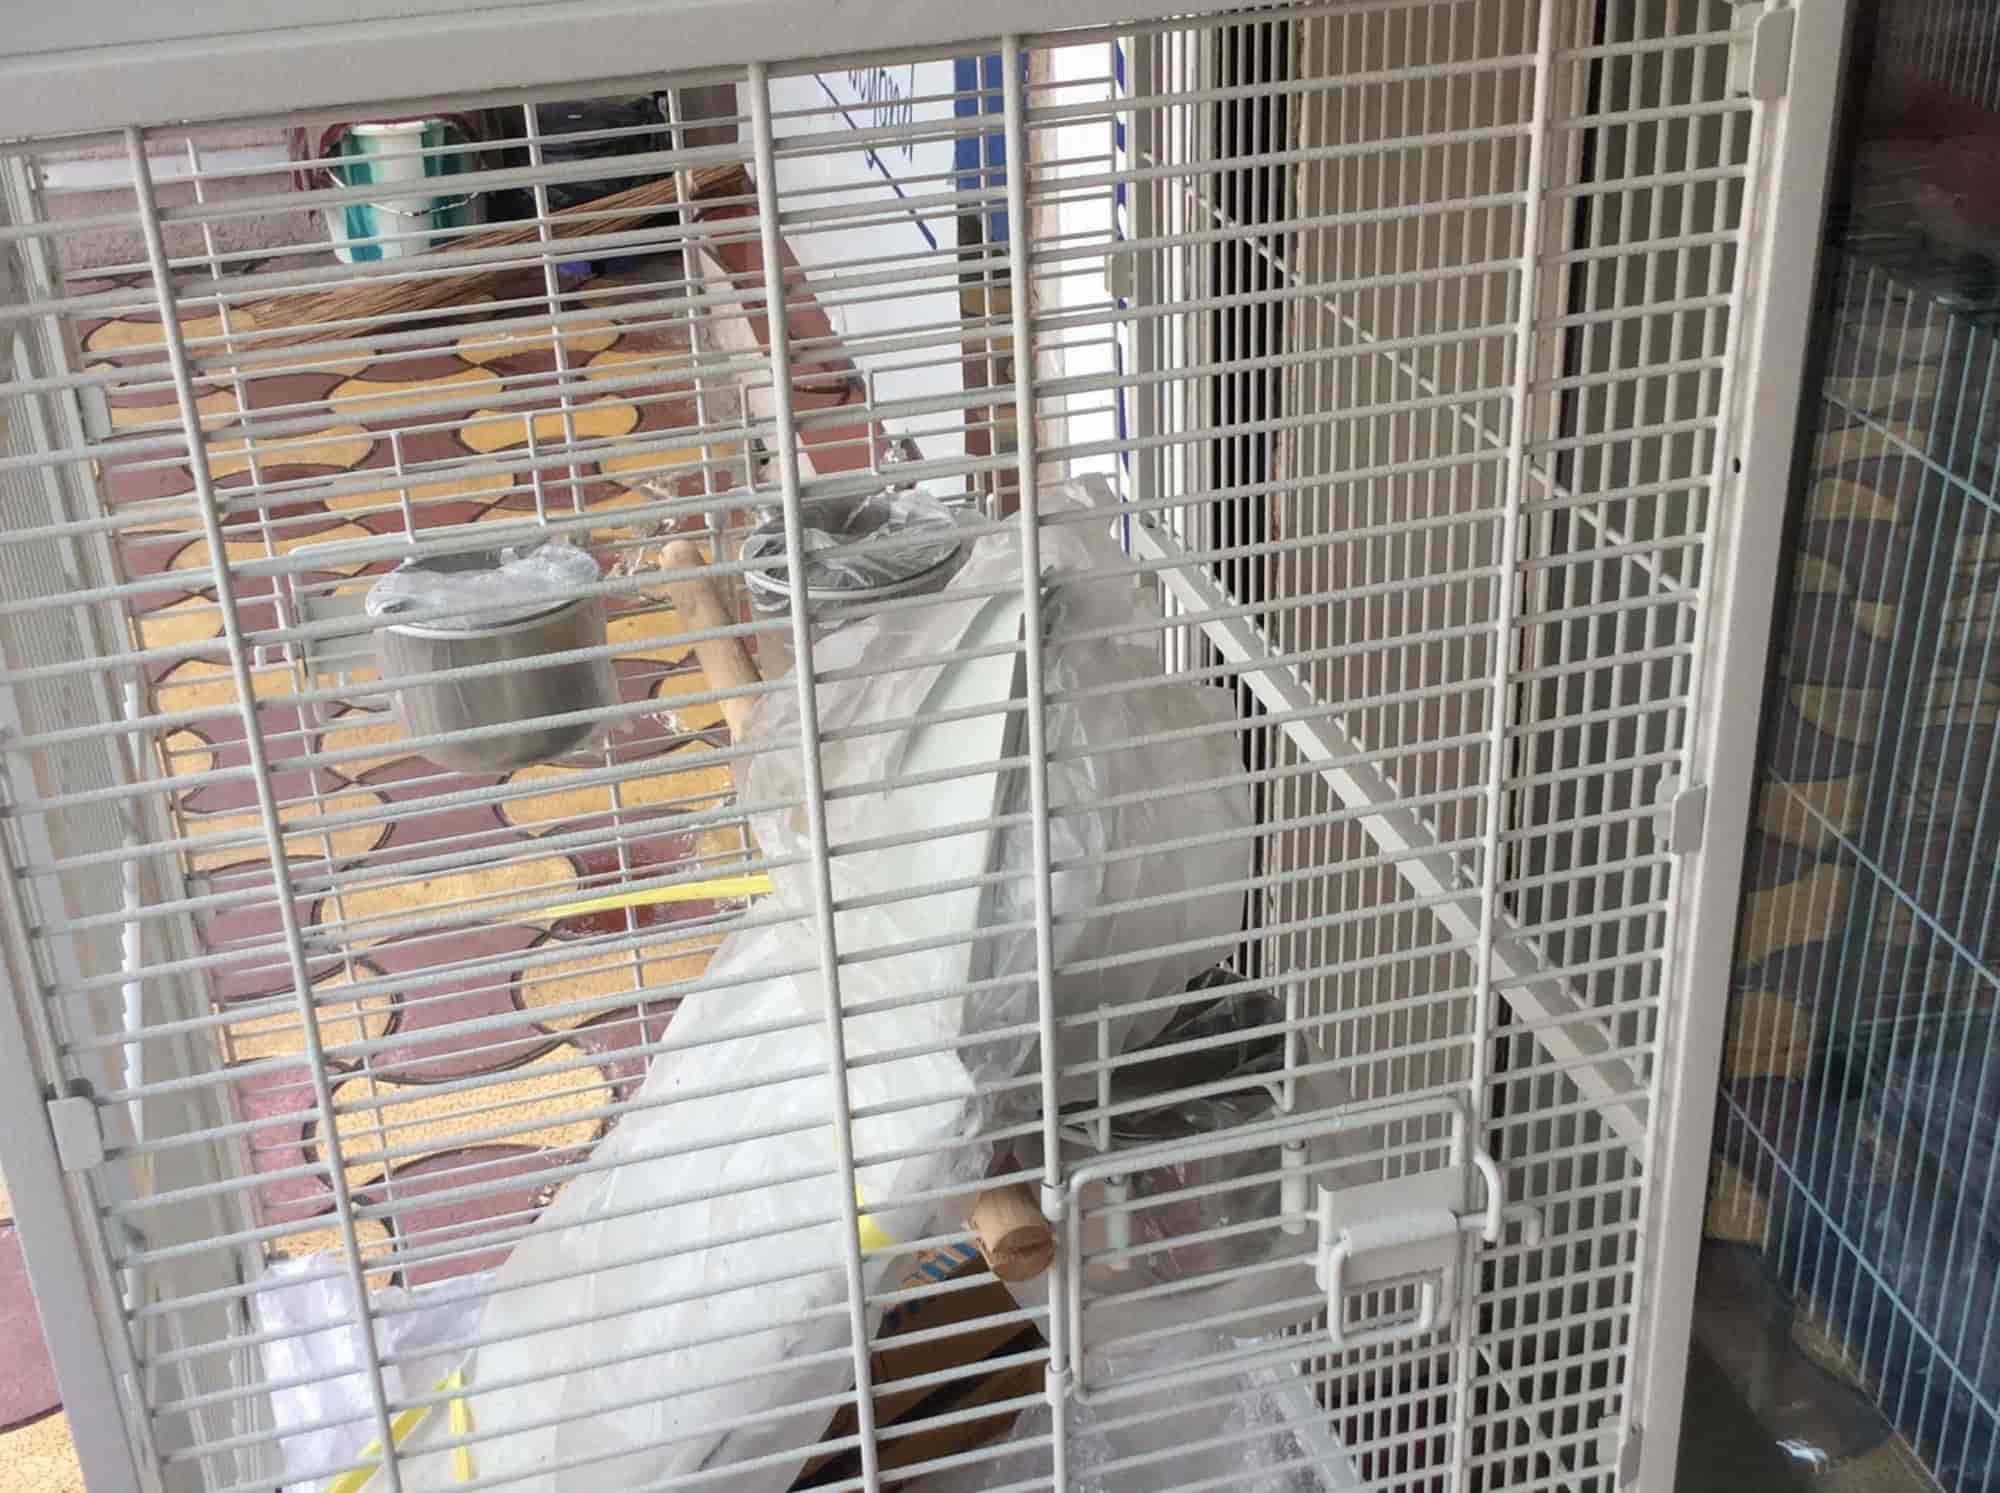 Rathods Birds Paradise, Goregaon West - Pet Shops in Mumbai